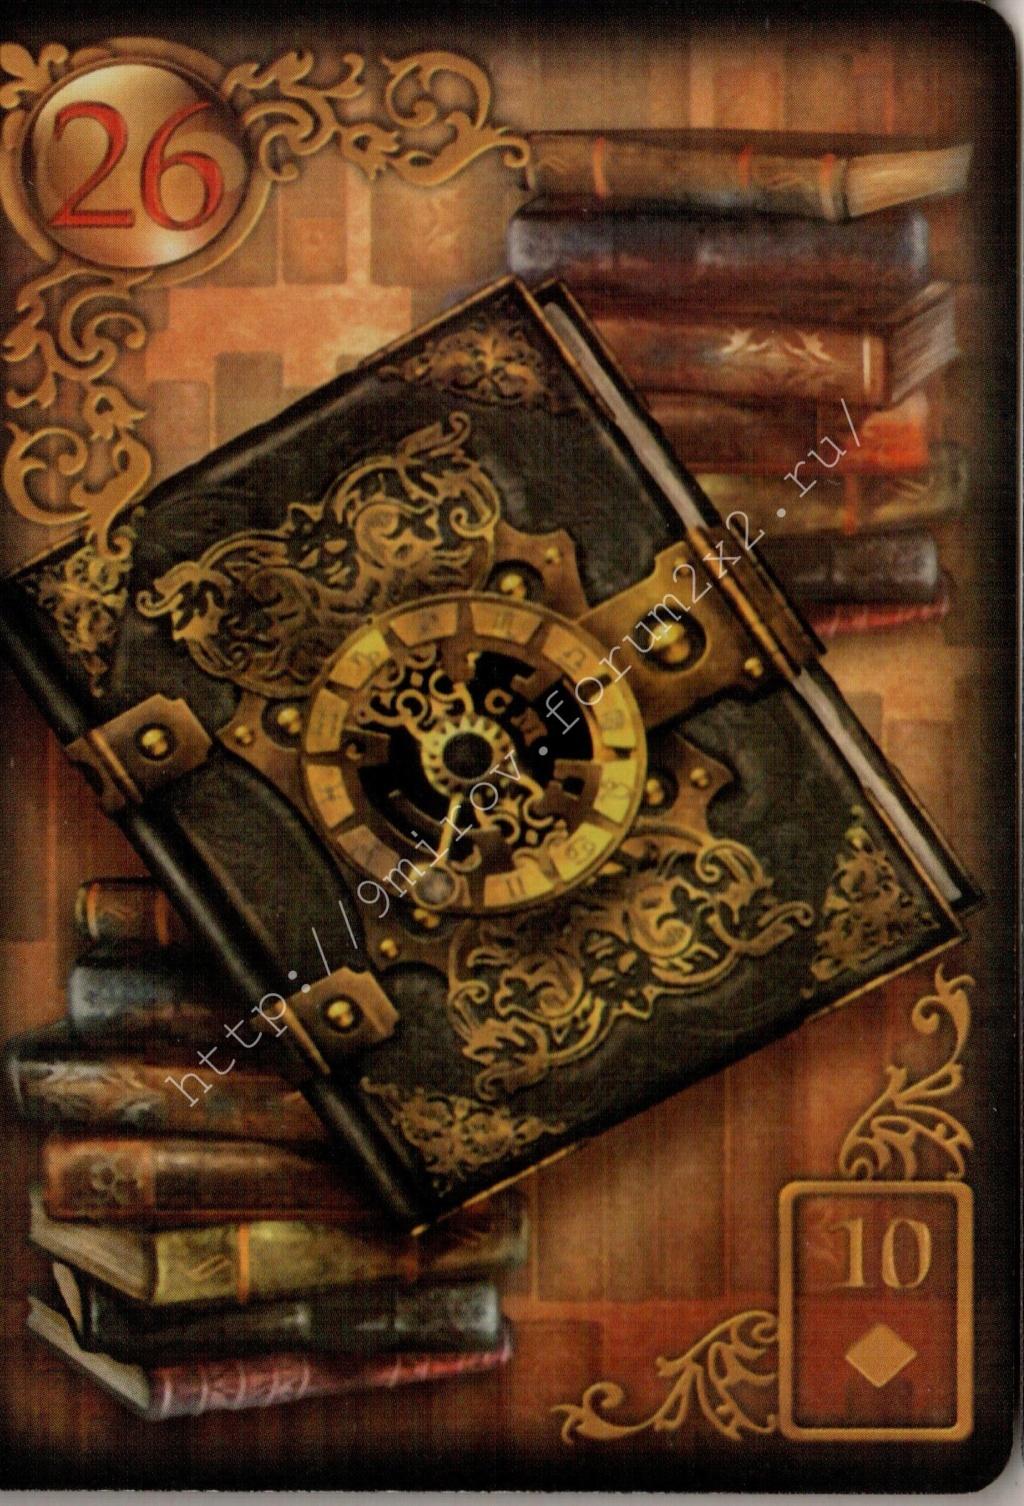 Золотые мечты Ленорман (Расширенное издание) | Gilded Reverie Lenormand. Галерея.  Water121